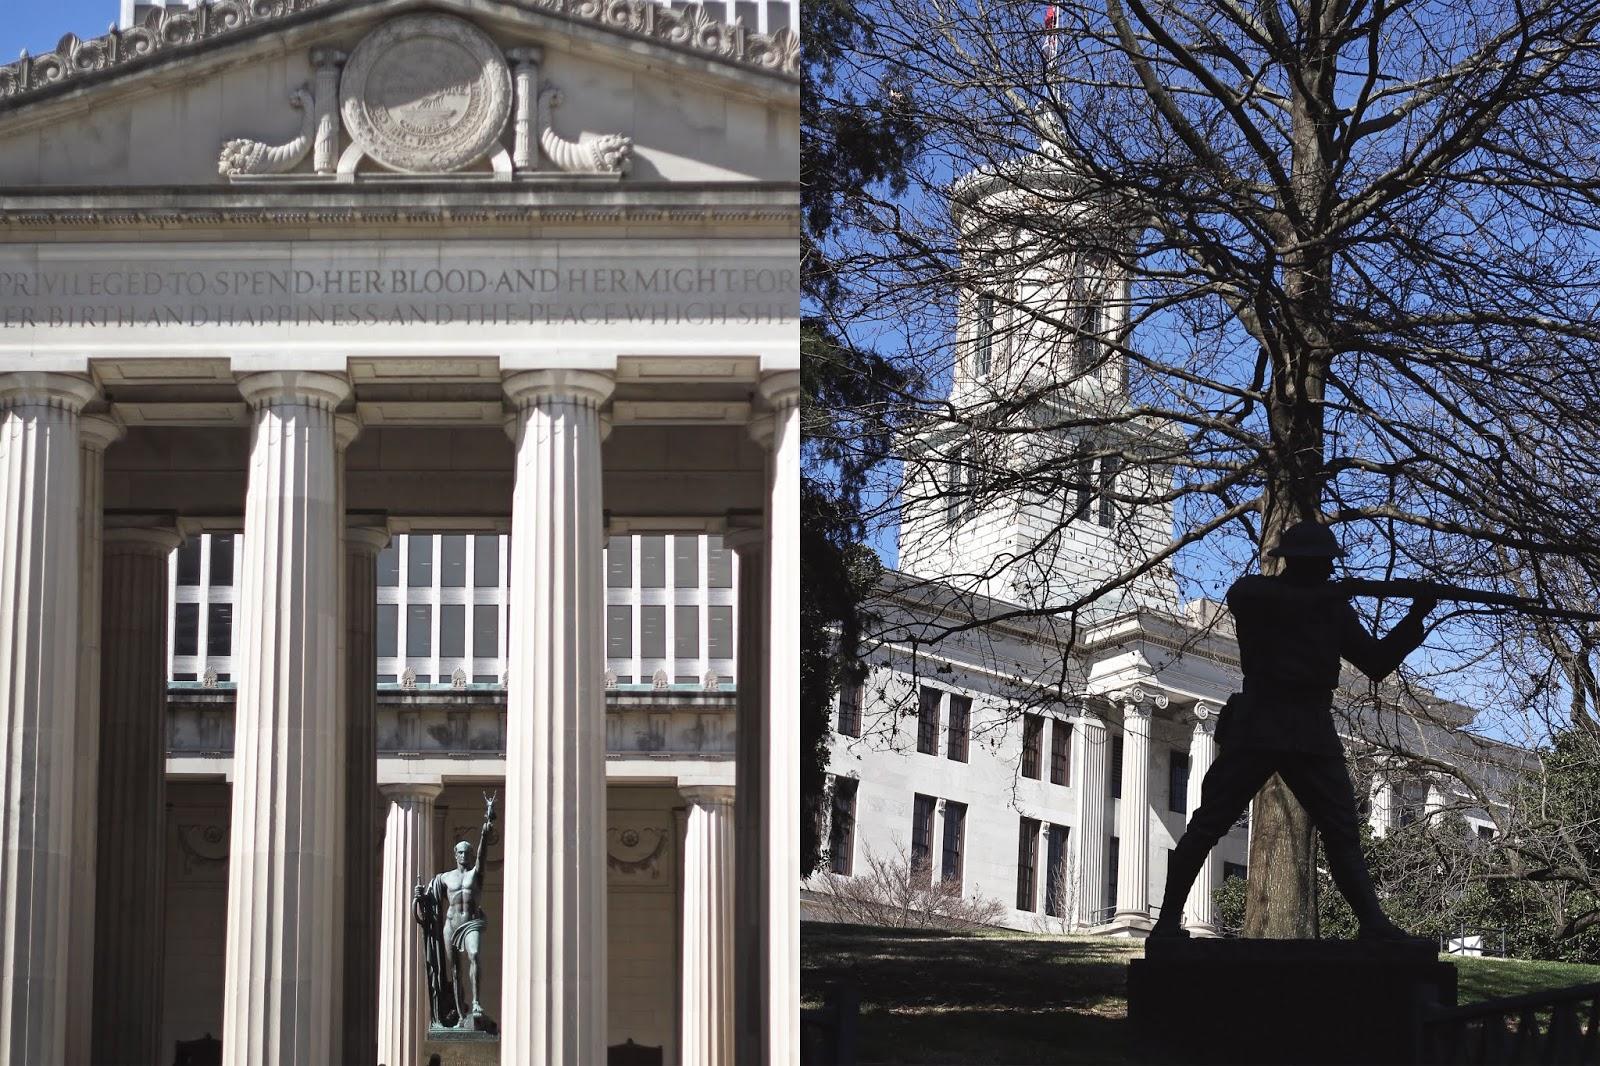 Architecture in Nashville, Andrew Jackson Nashville, Nashville State Capitol, Nashville Travel Guide